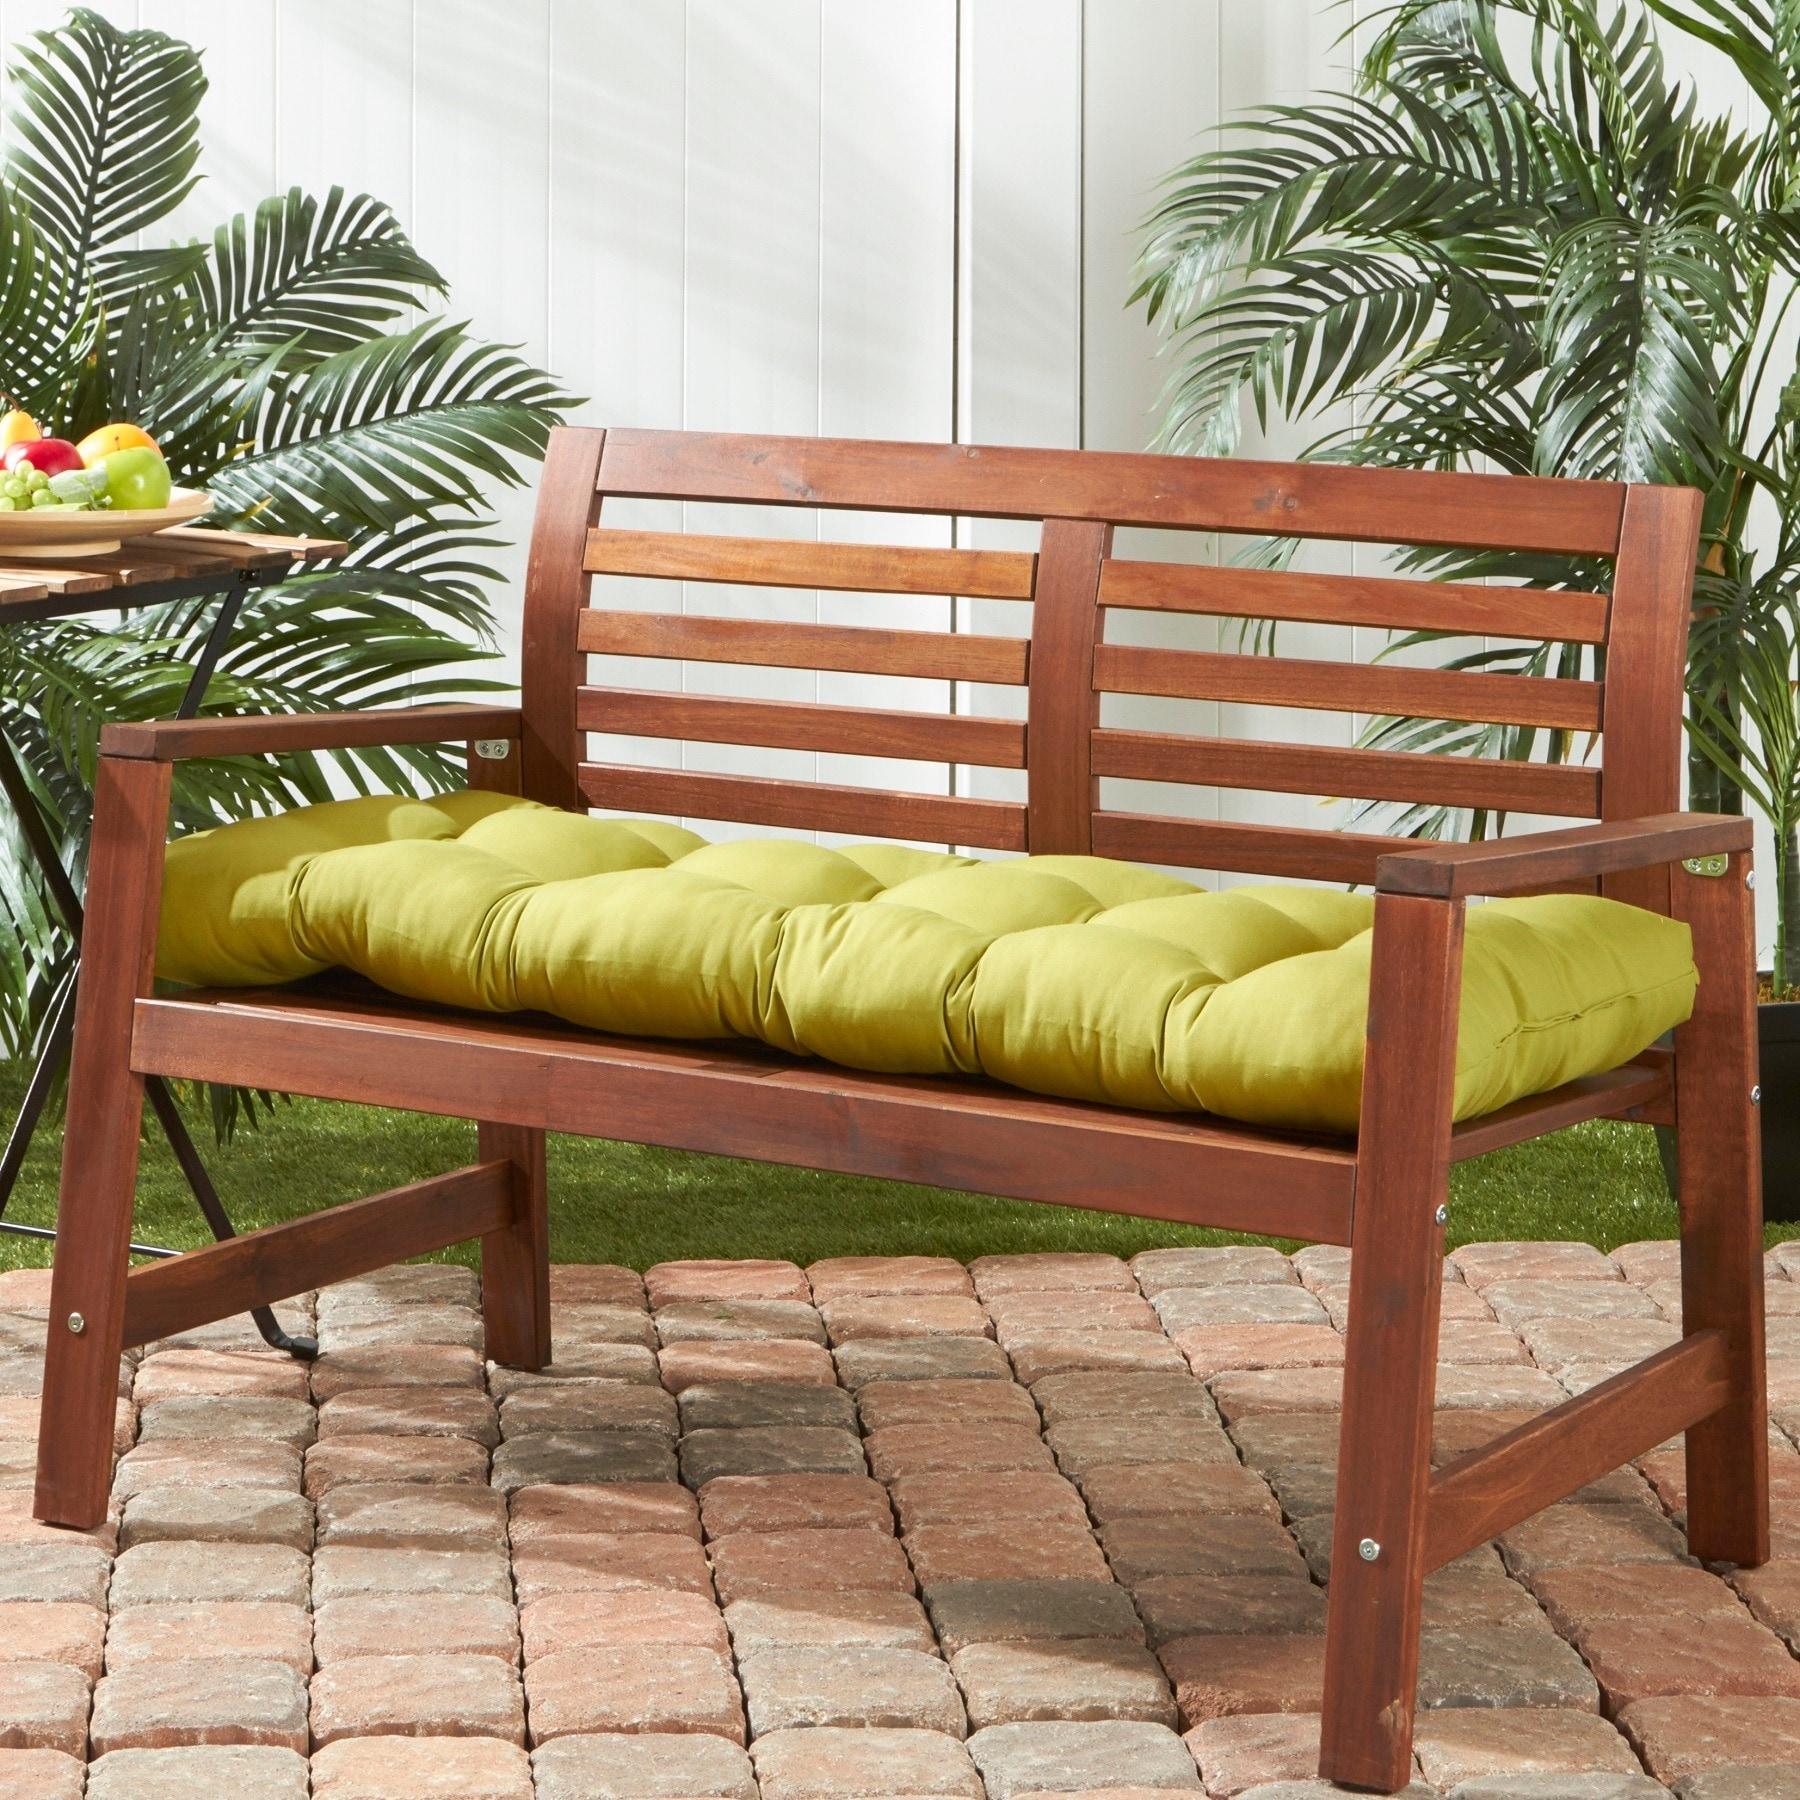 Shop Greendale Home Fashions Outdoor Kiwi Bench Cushion 18w X 51l